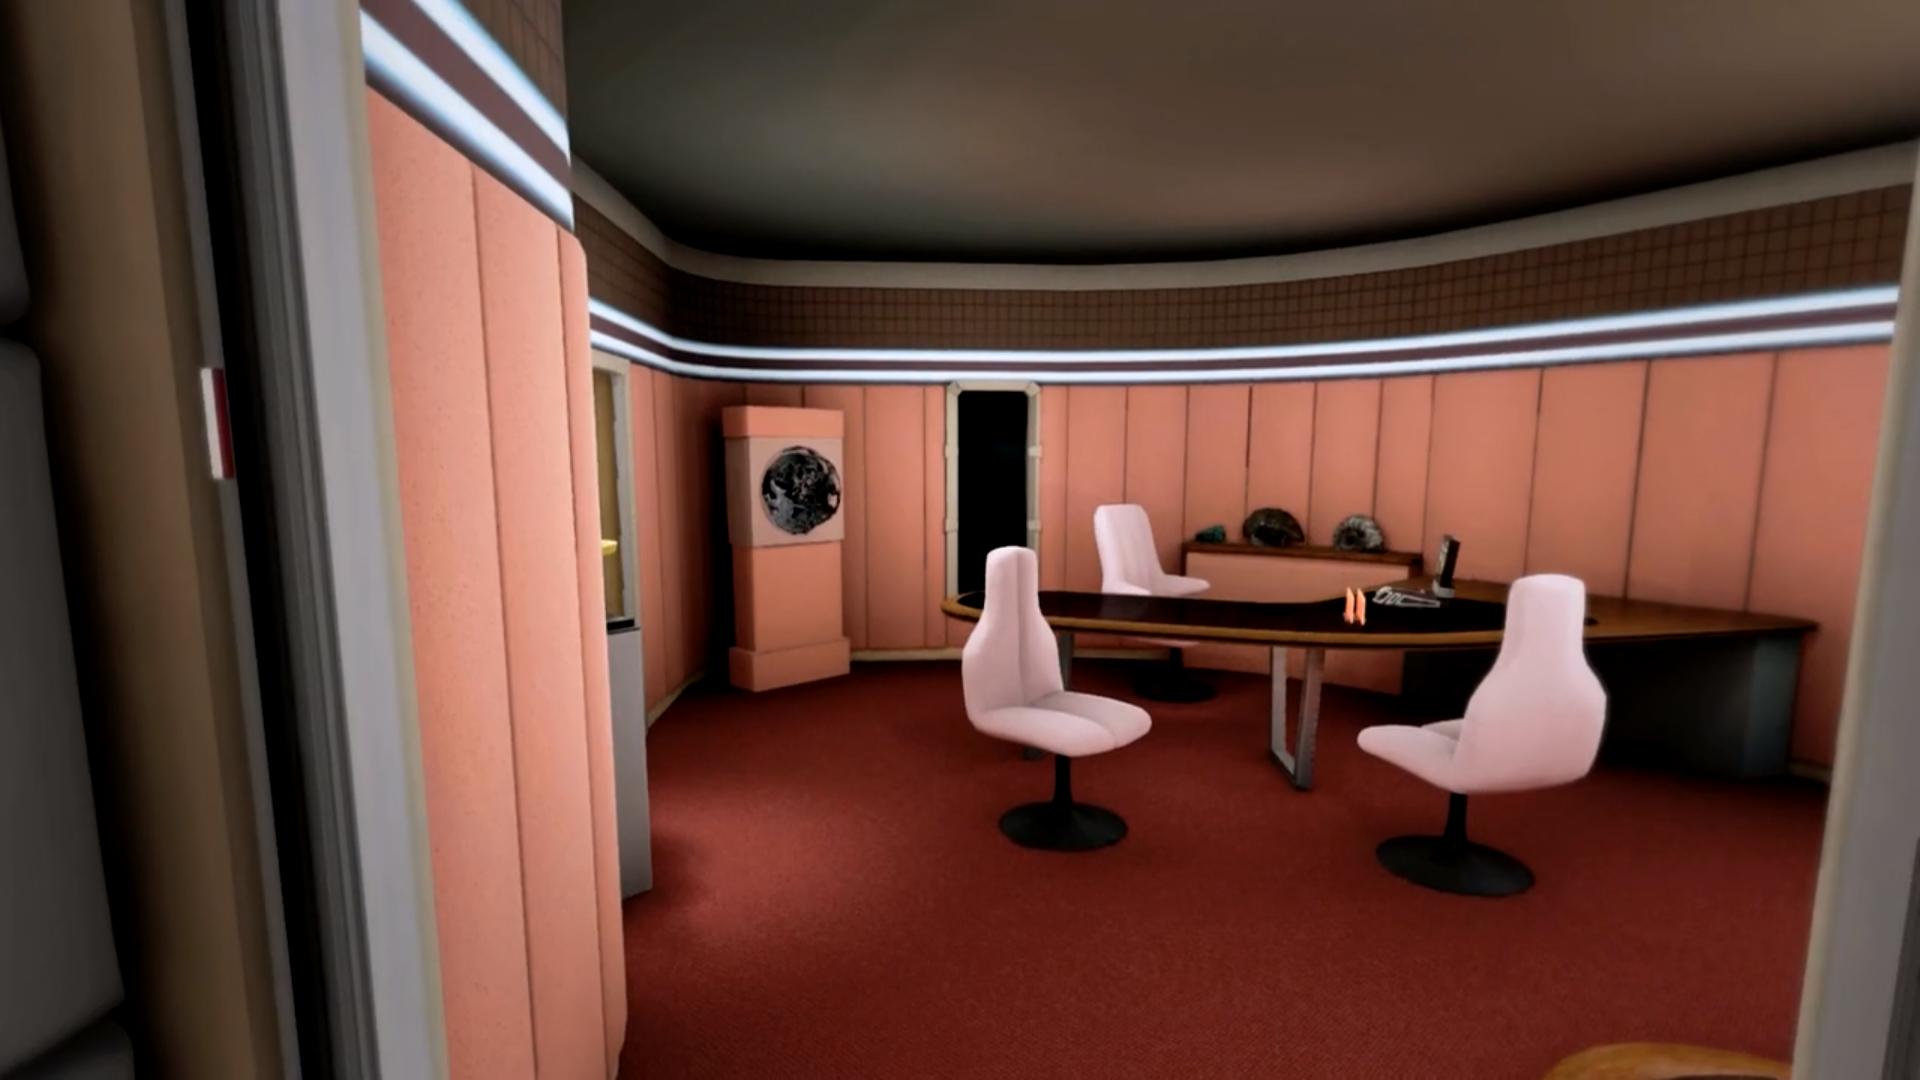 Virtual Bathroom Designer Star Trek Virtual Reality Ever Wanted To Explore The